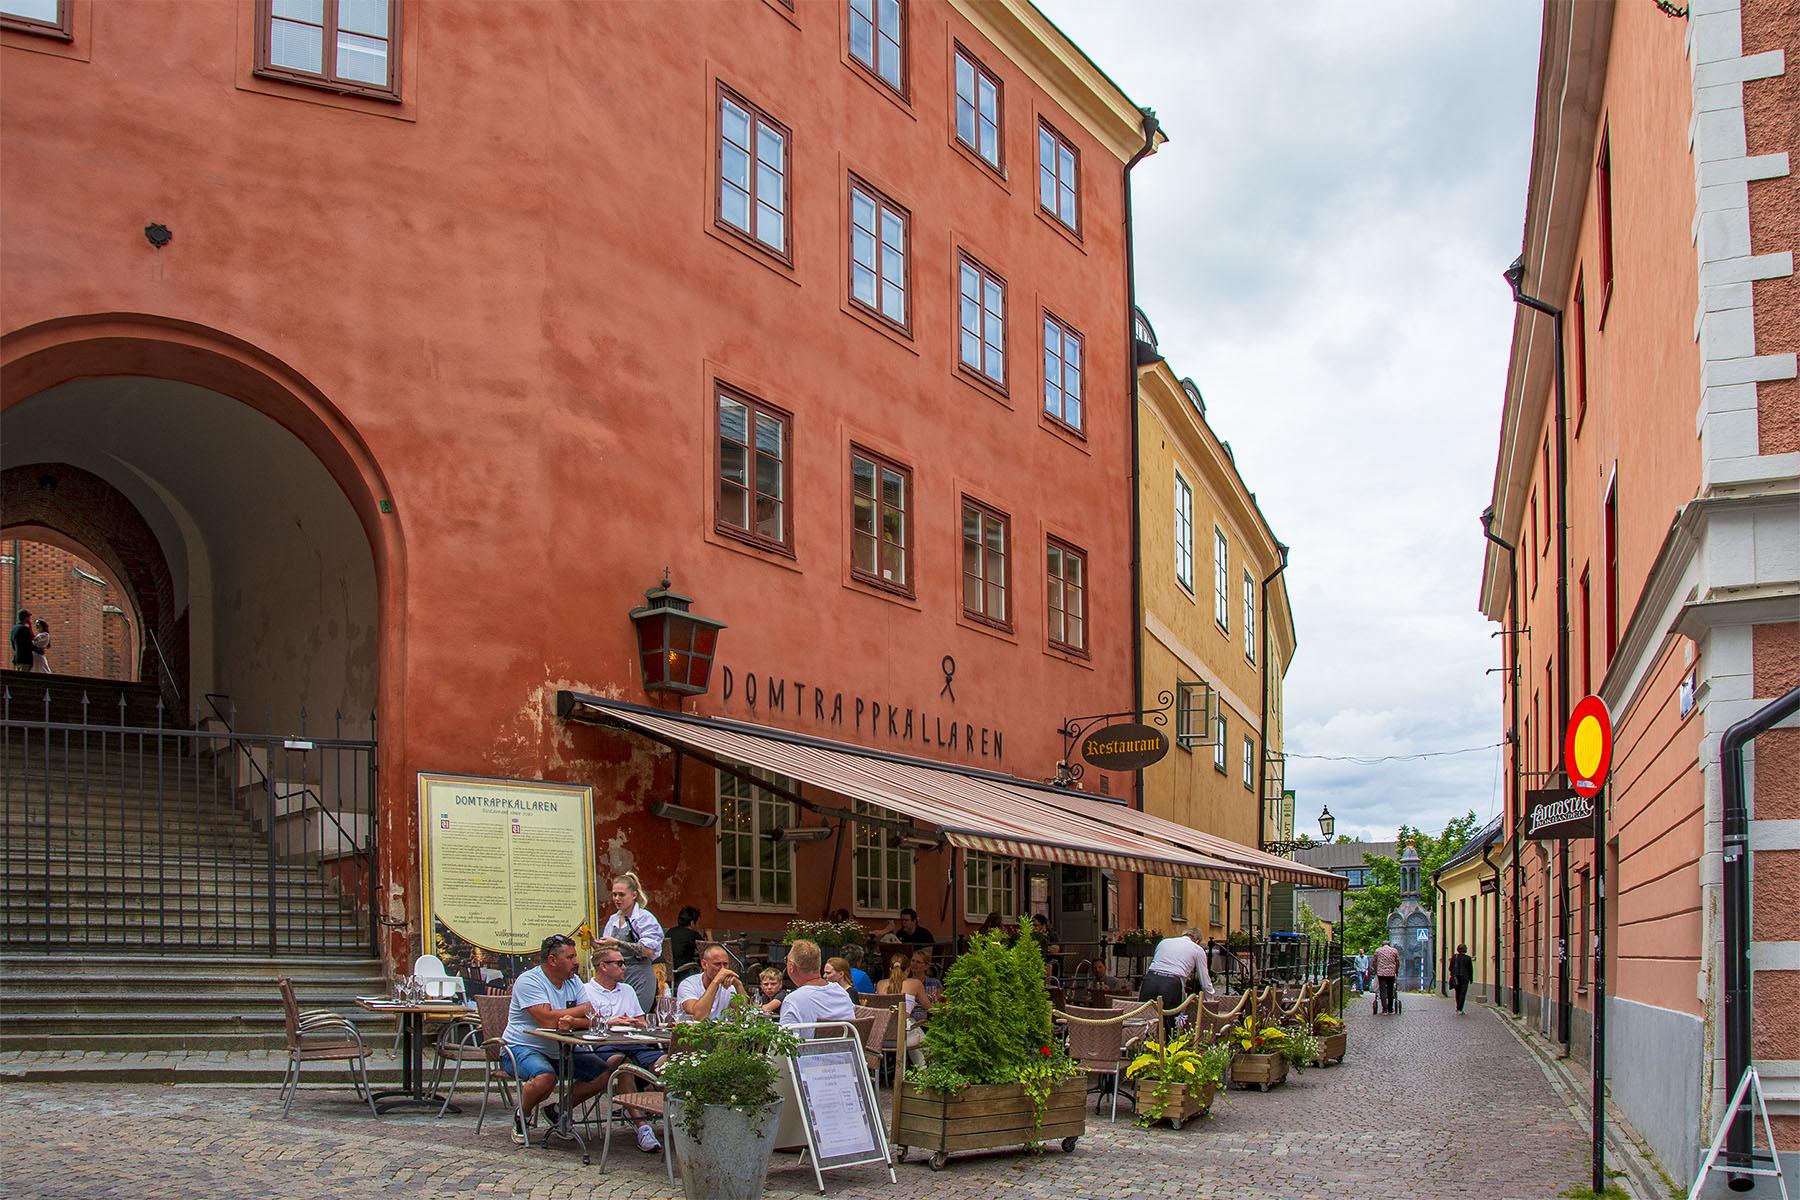 Domtrappkällaren Uppsala